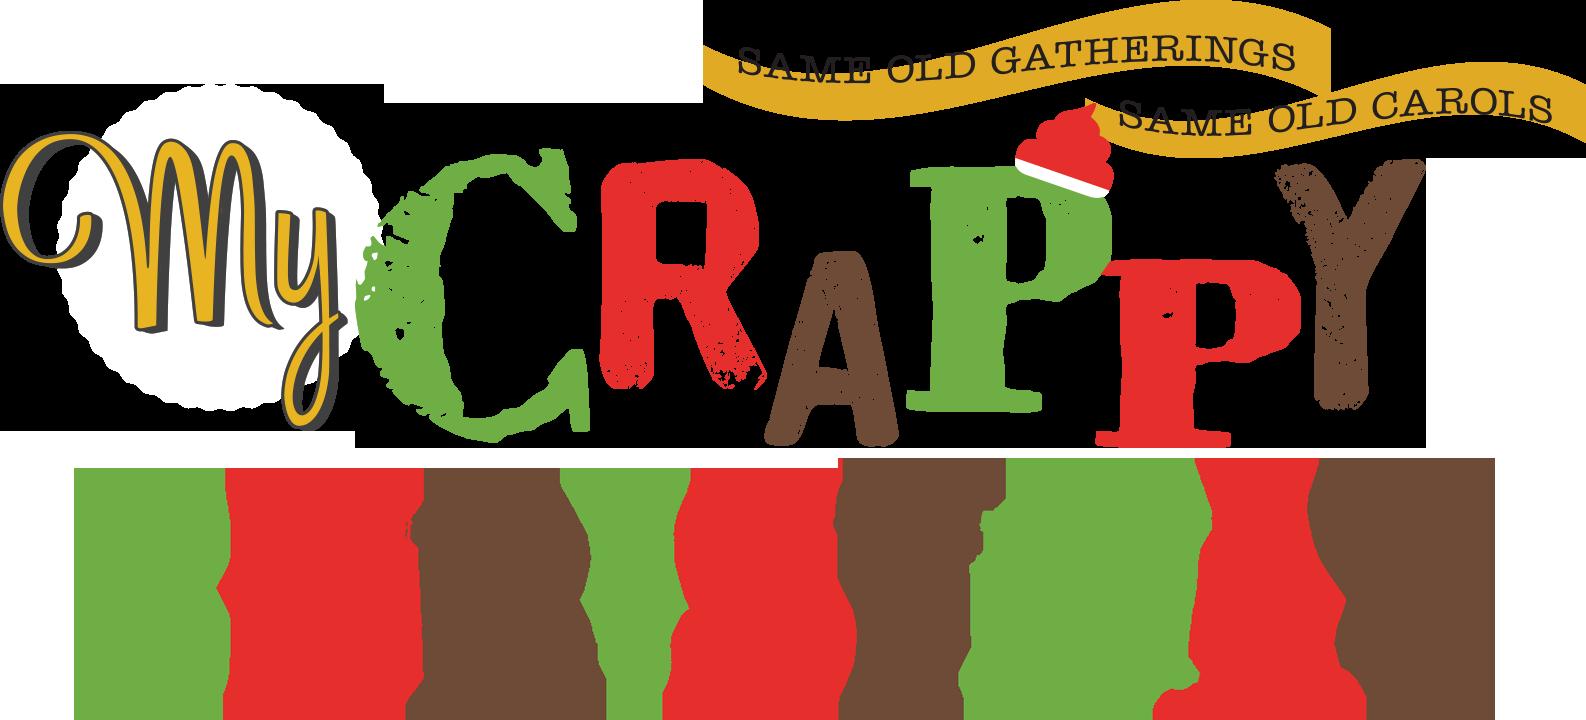 Church christmas party clipart vector freeuse download Christmas at Hope Church | Hope Church Singapore vector freeuse download